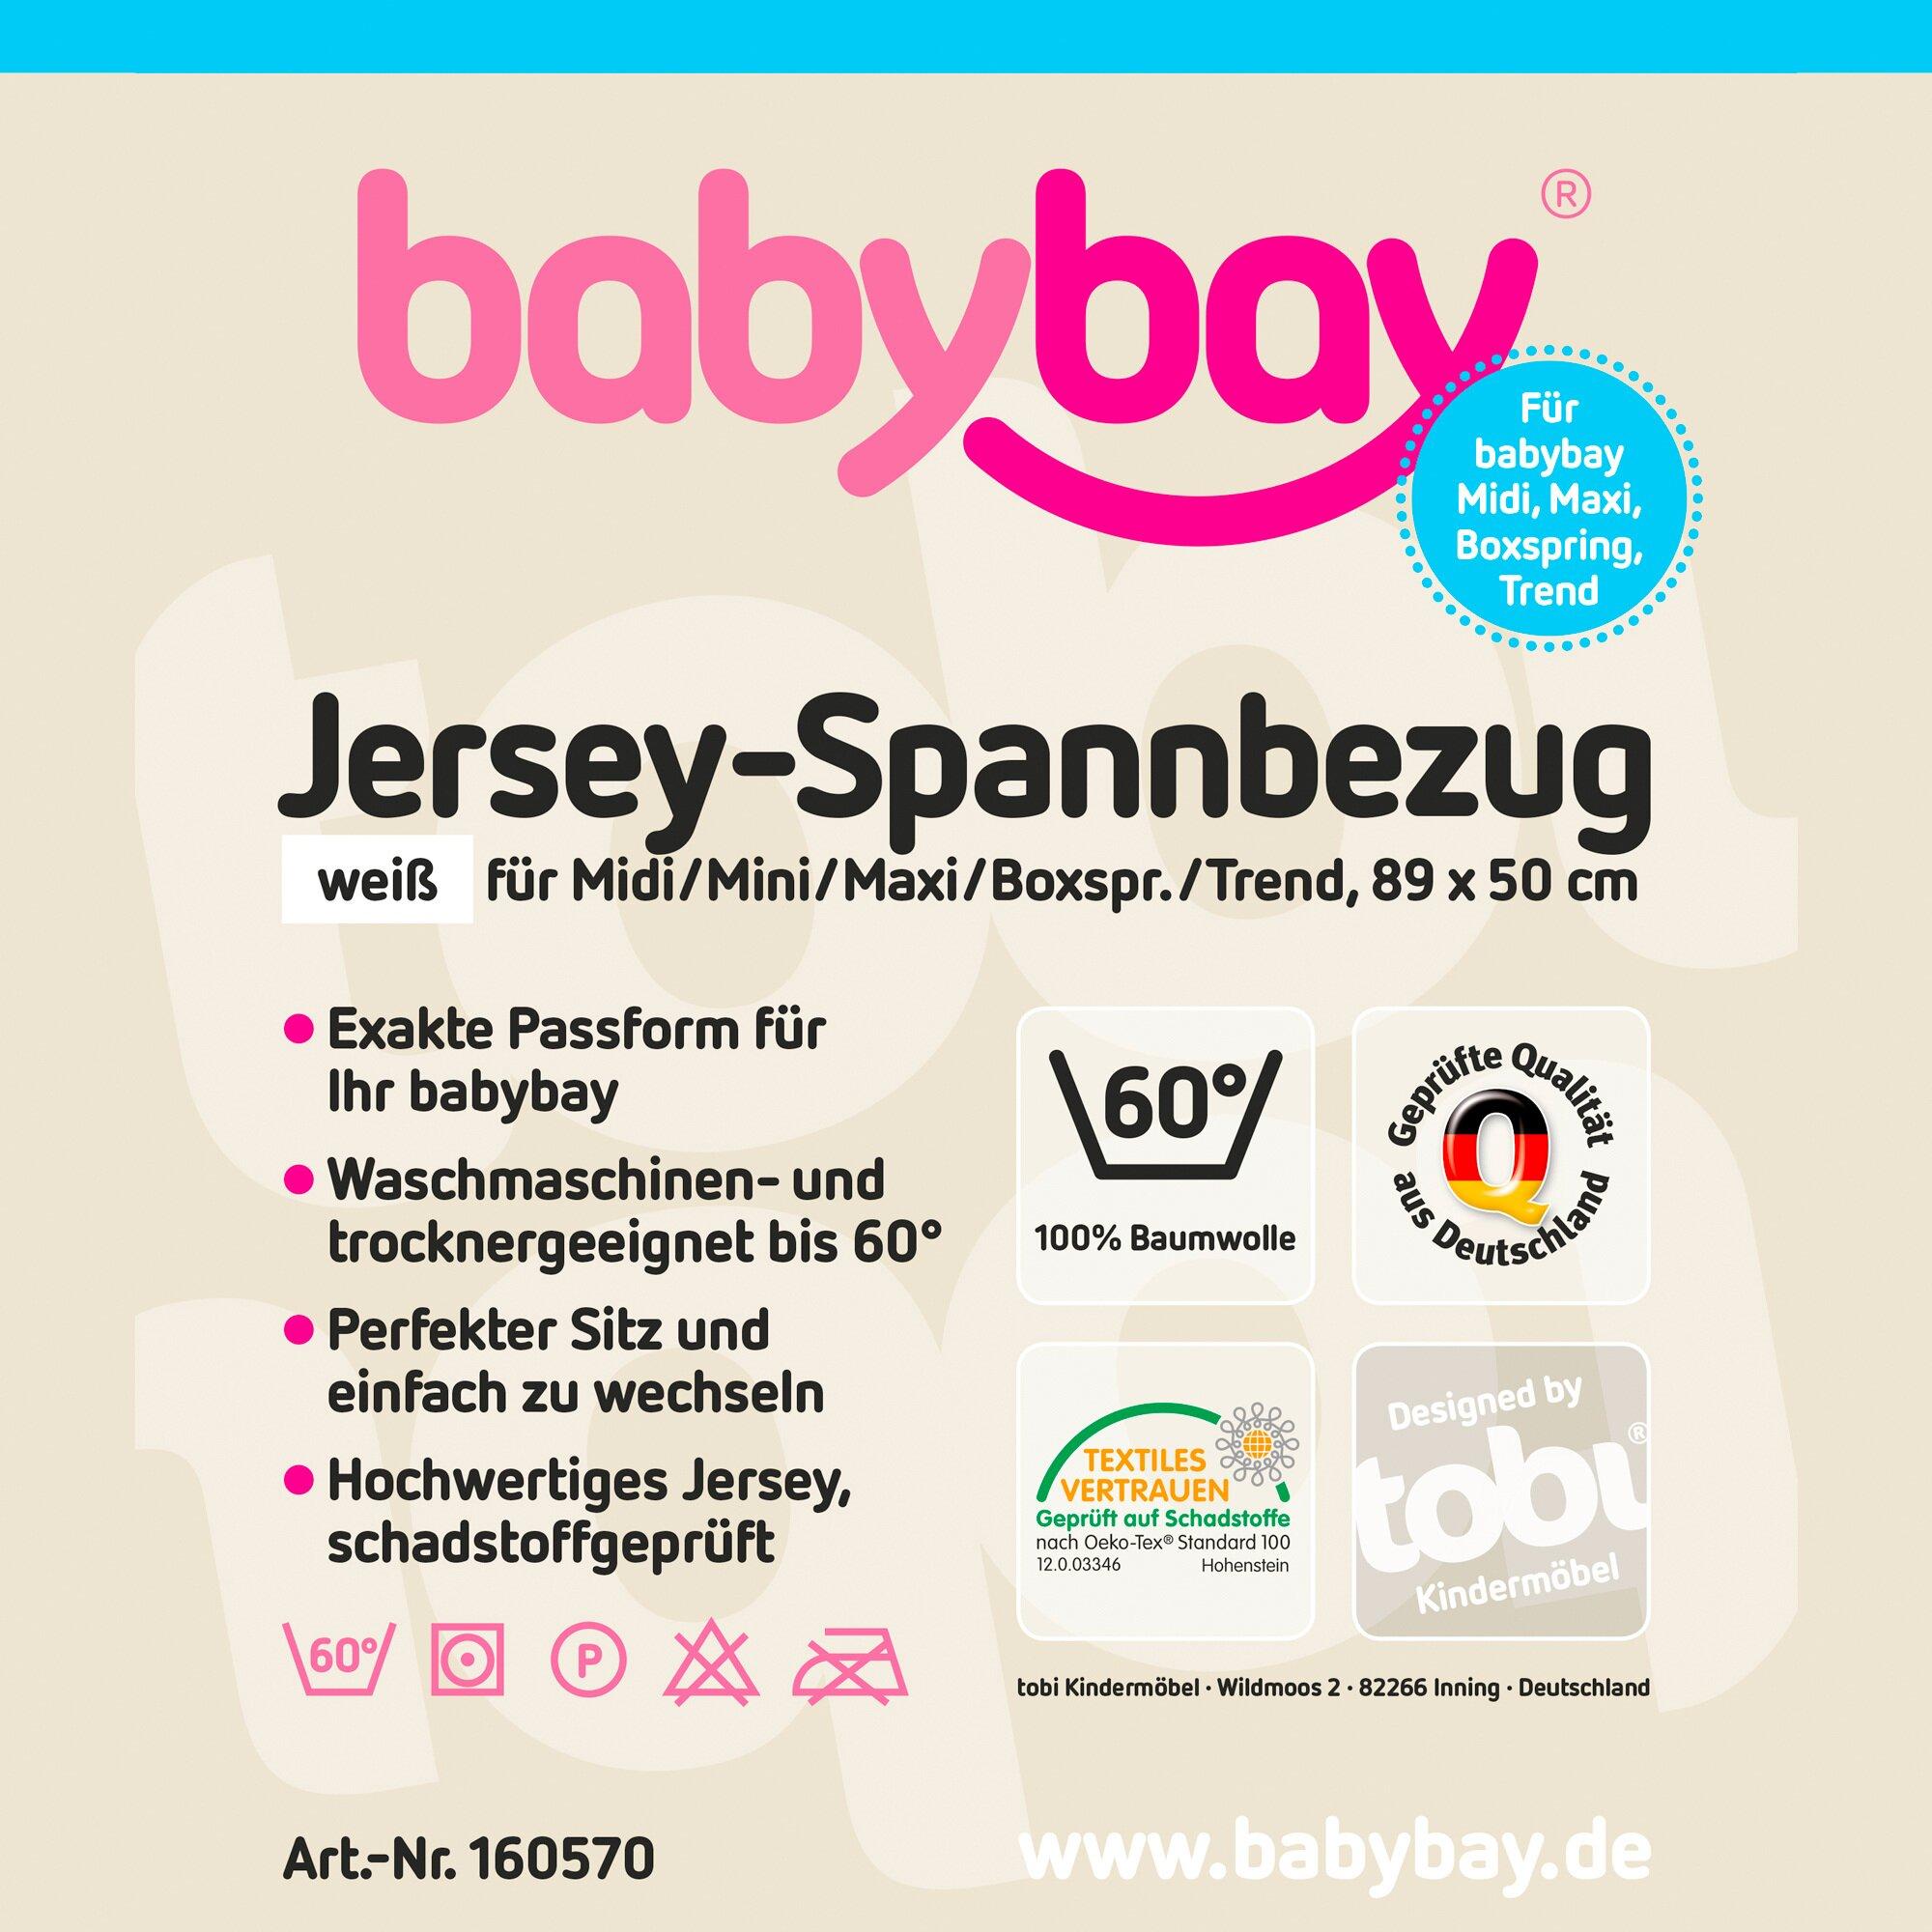 babybay-jersey-spannbetttuch-fur-beistellbett-maxi-89x50-cm-weiss